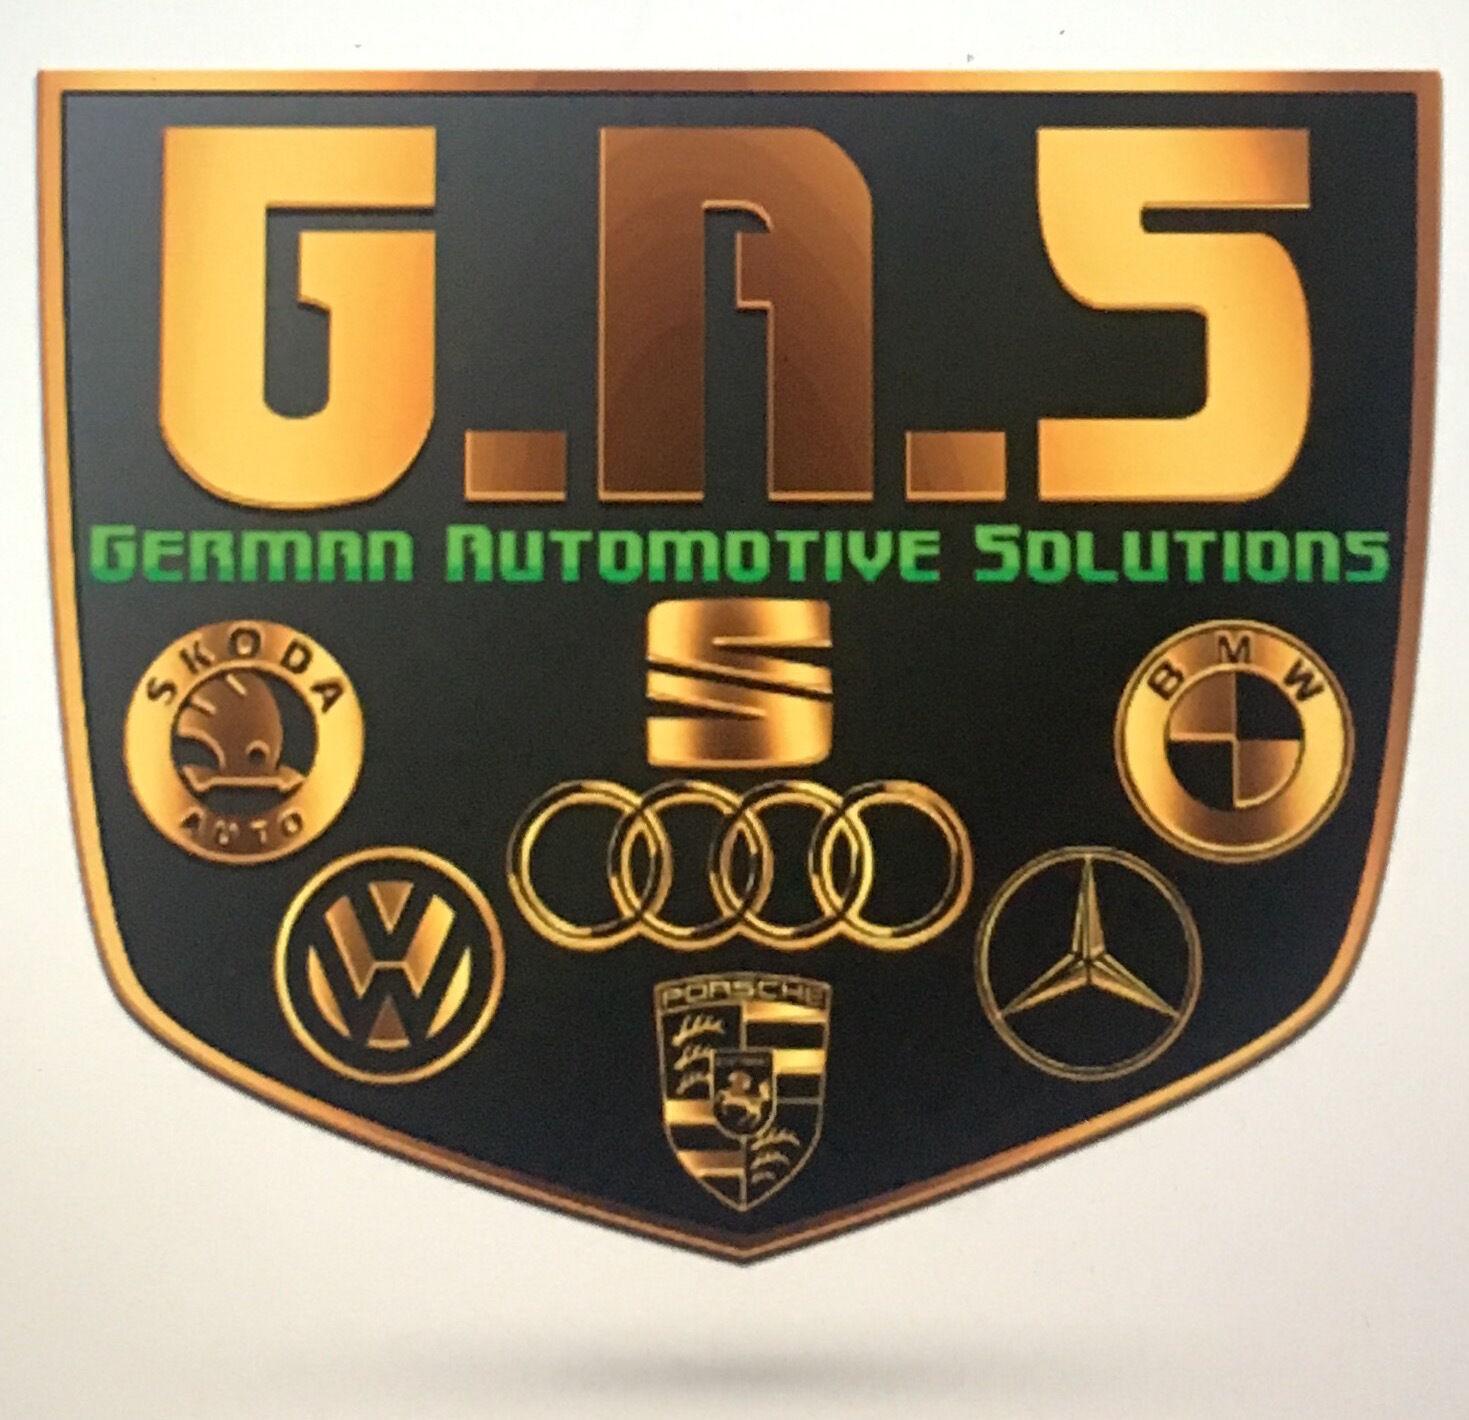 G.A.S German Automotive Solutions